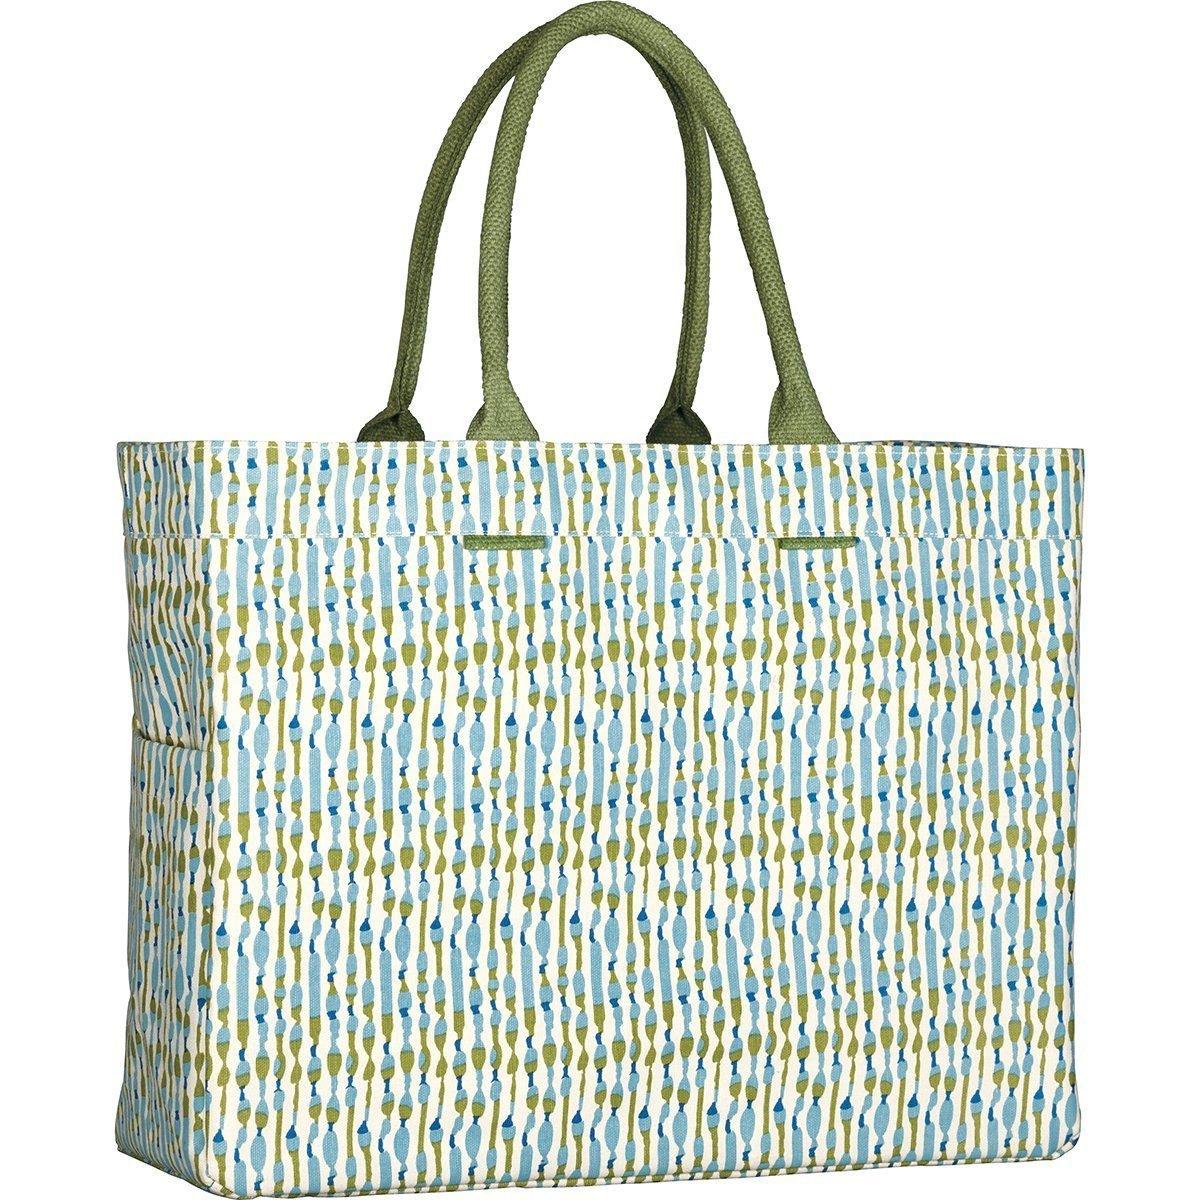 rockflowerpaper Athena Ocean Blue Green Canvas Carryall Tote Shoulder Bag